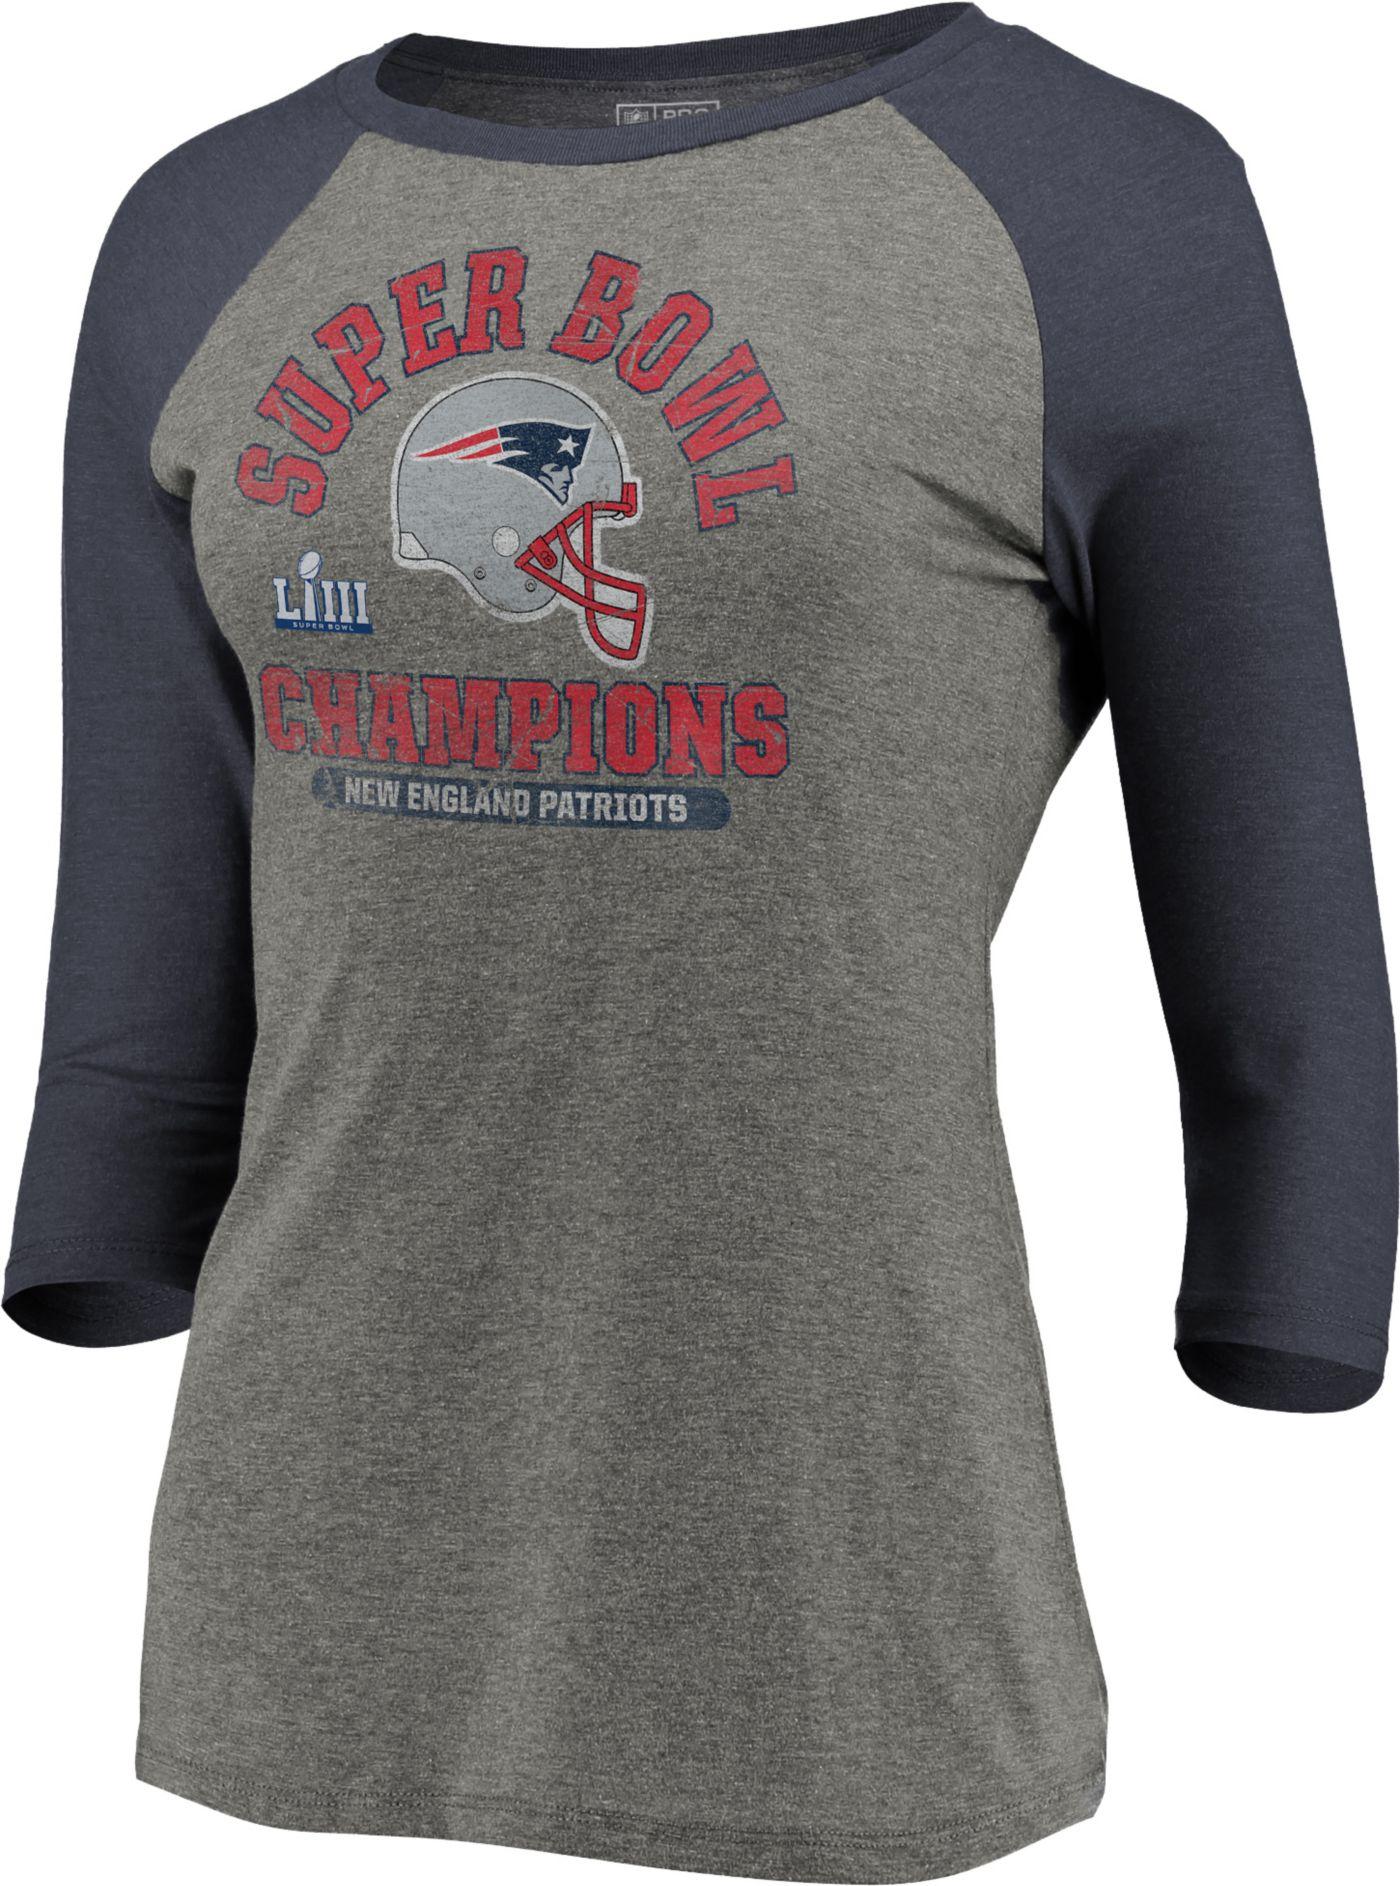 NFL Women's Super Bowl LIII Champions New England Patriots Double Coverage Raglan